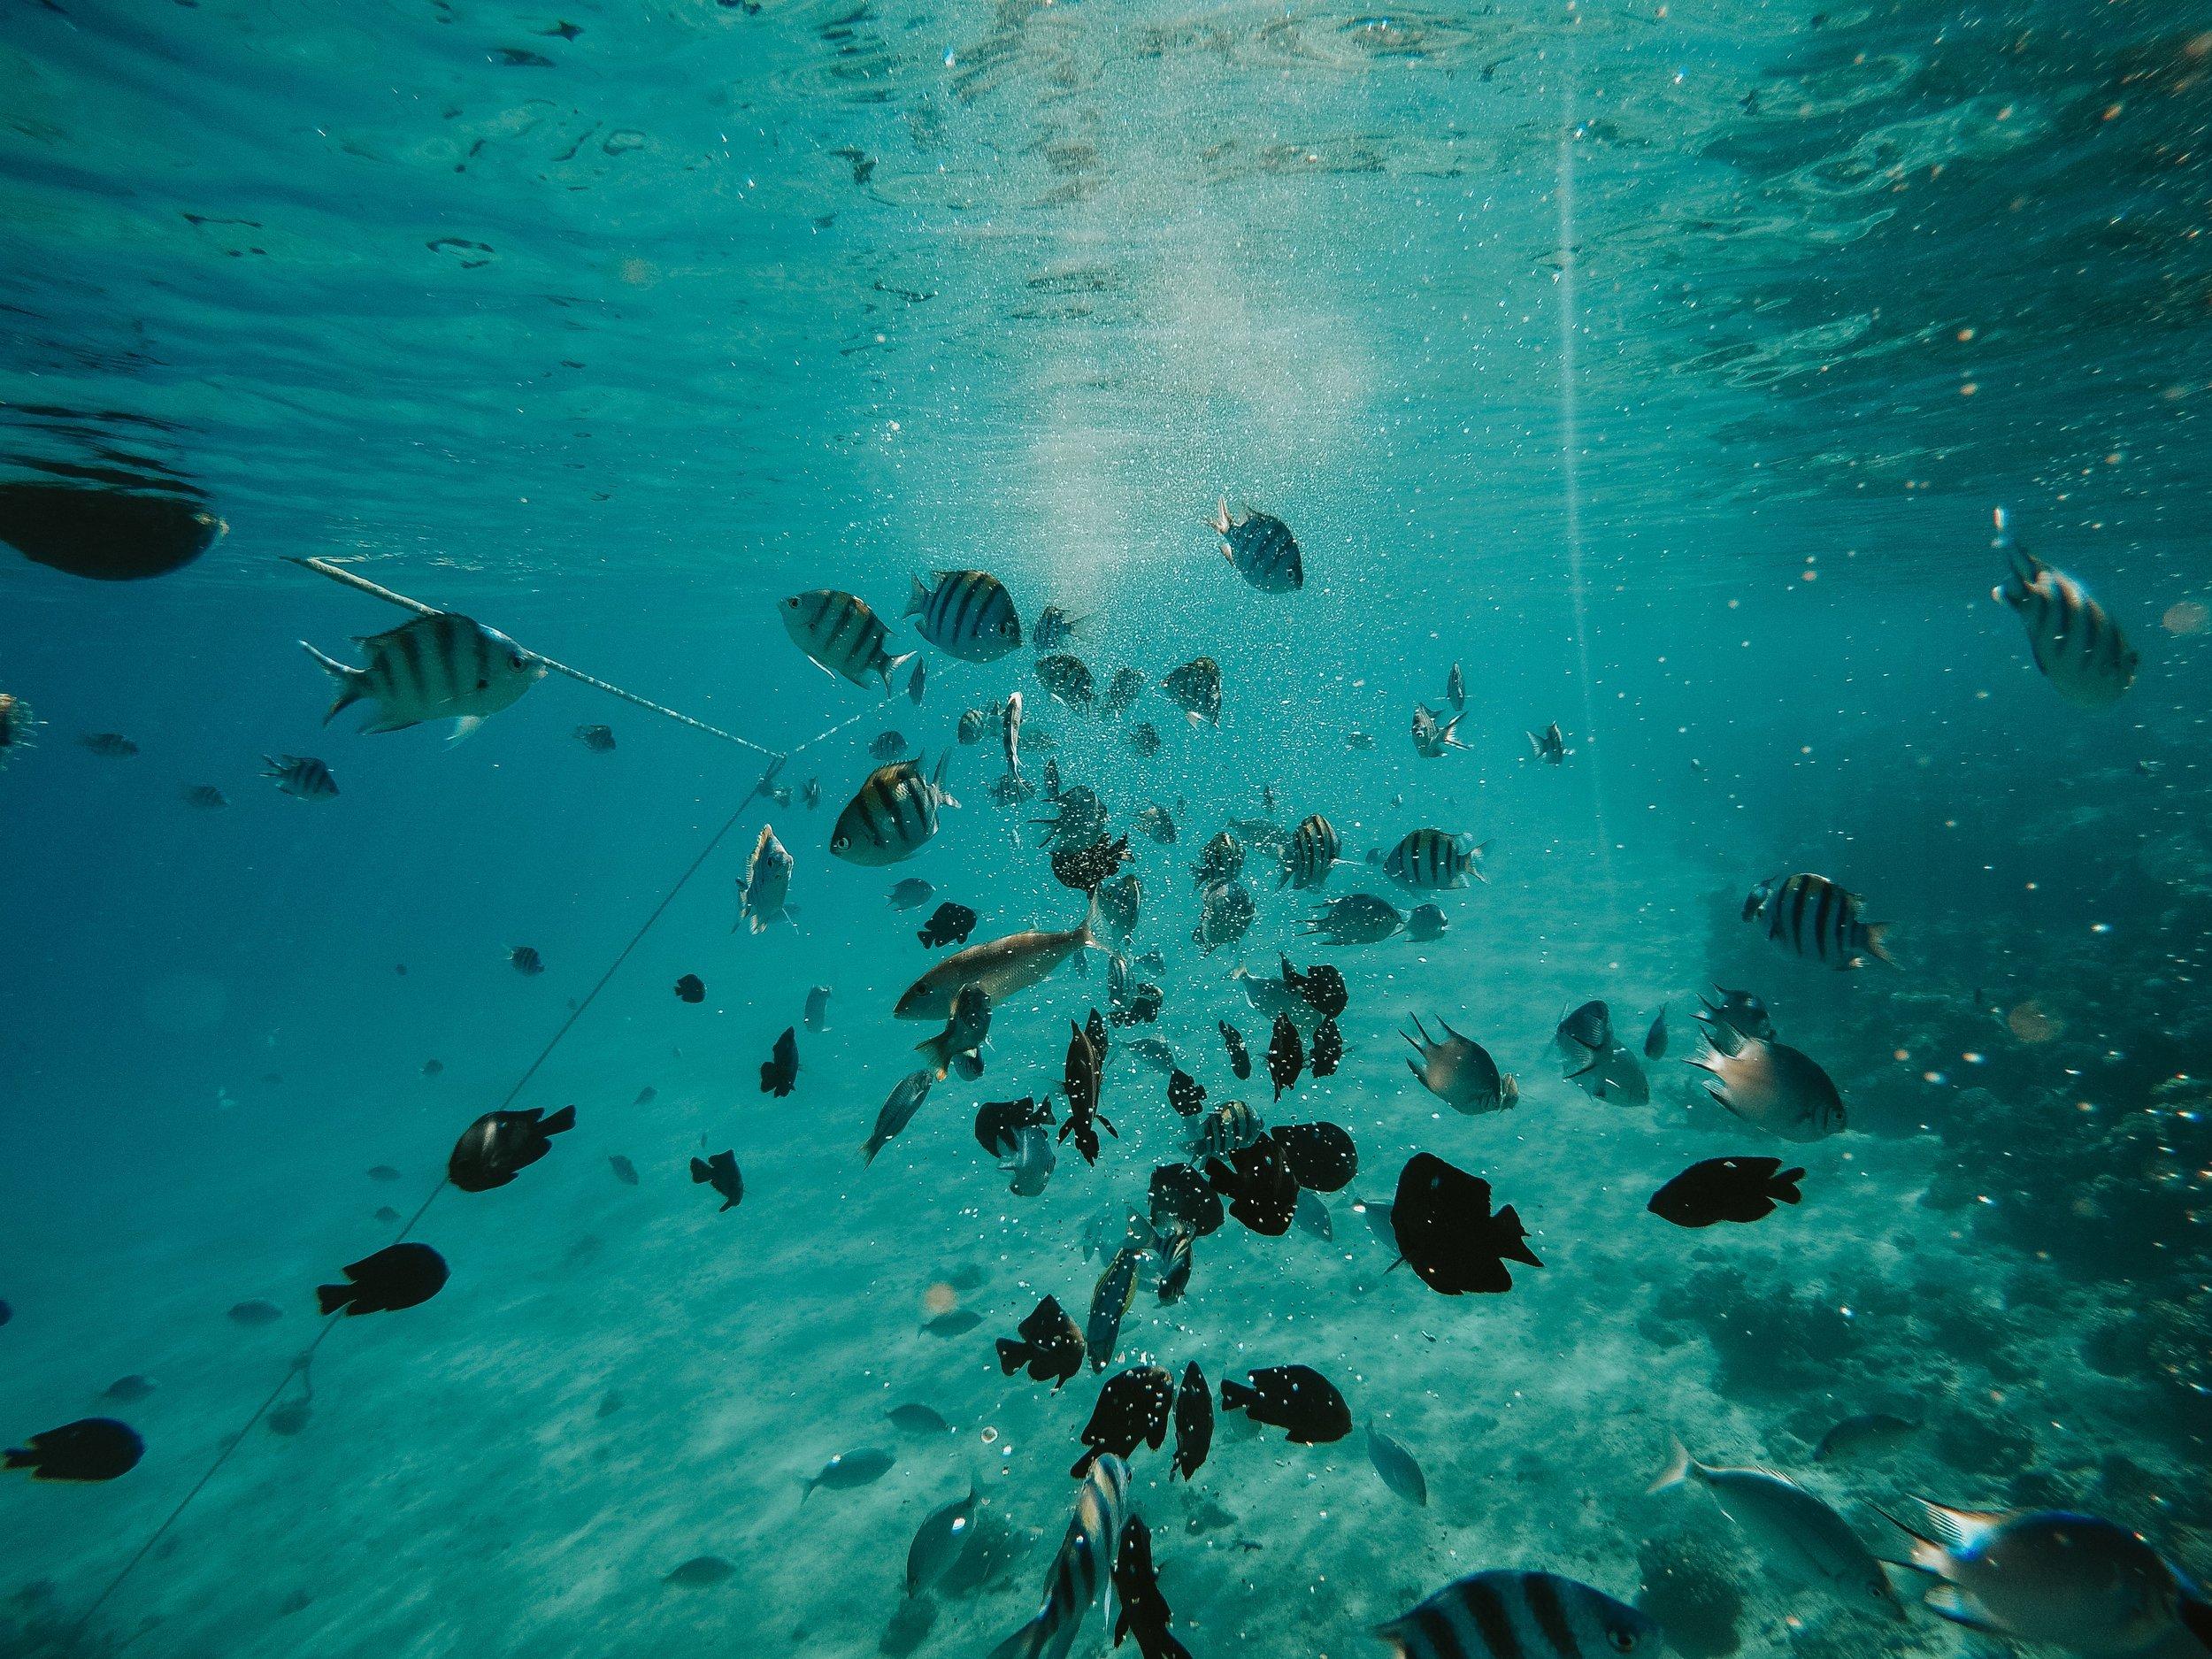 animal-animal-photography-aquatic-1821724.jpg